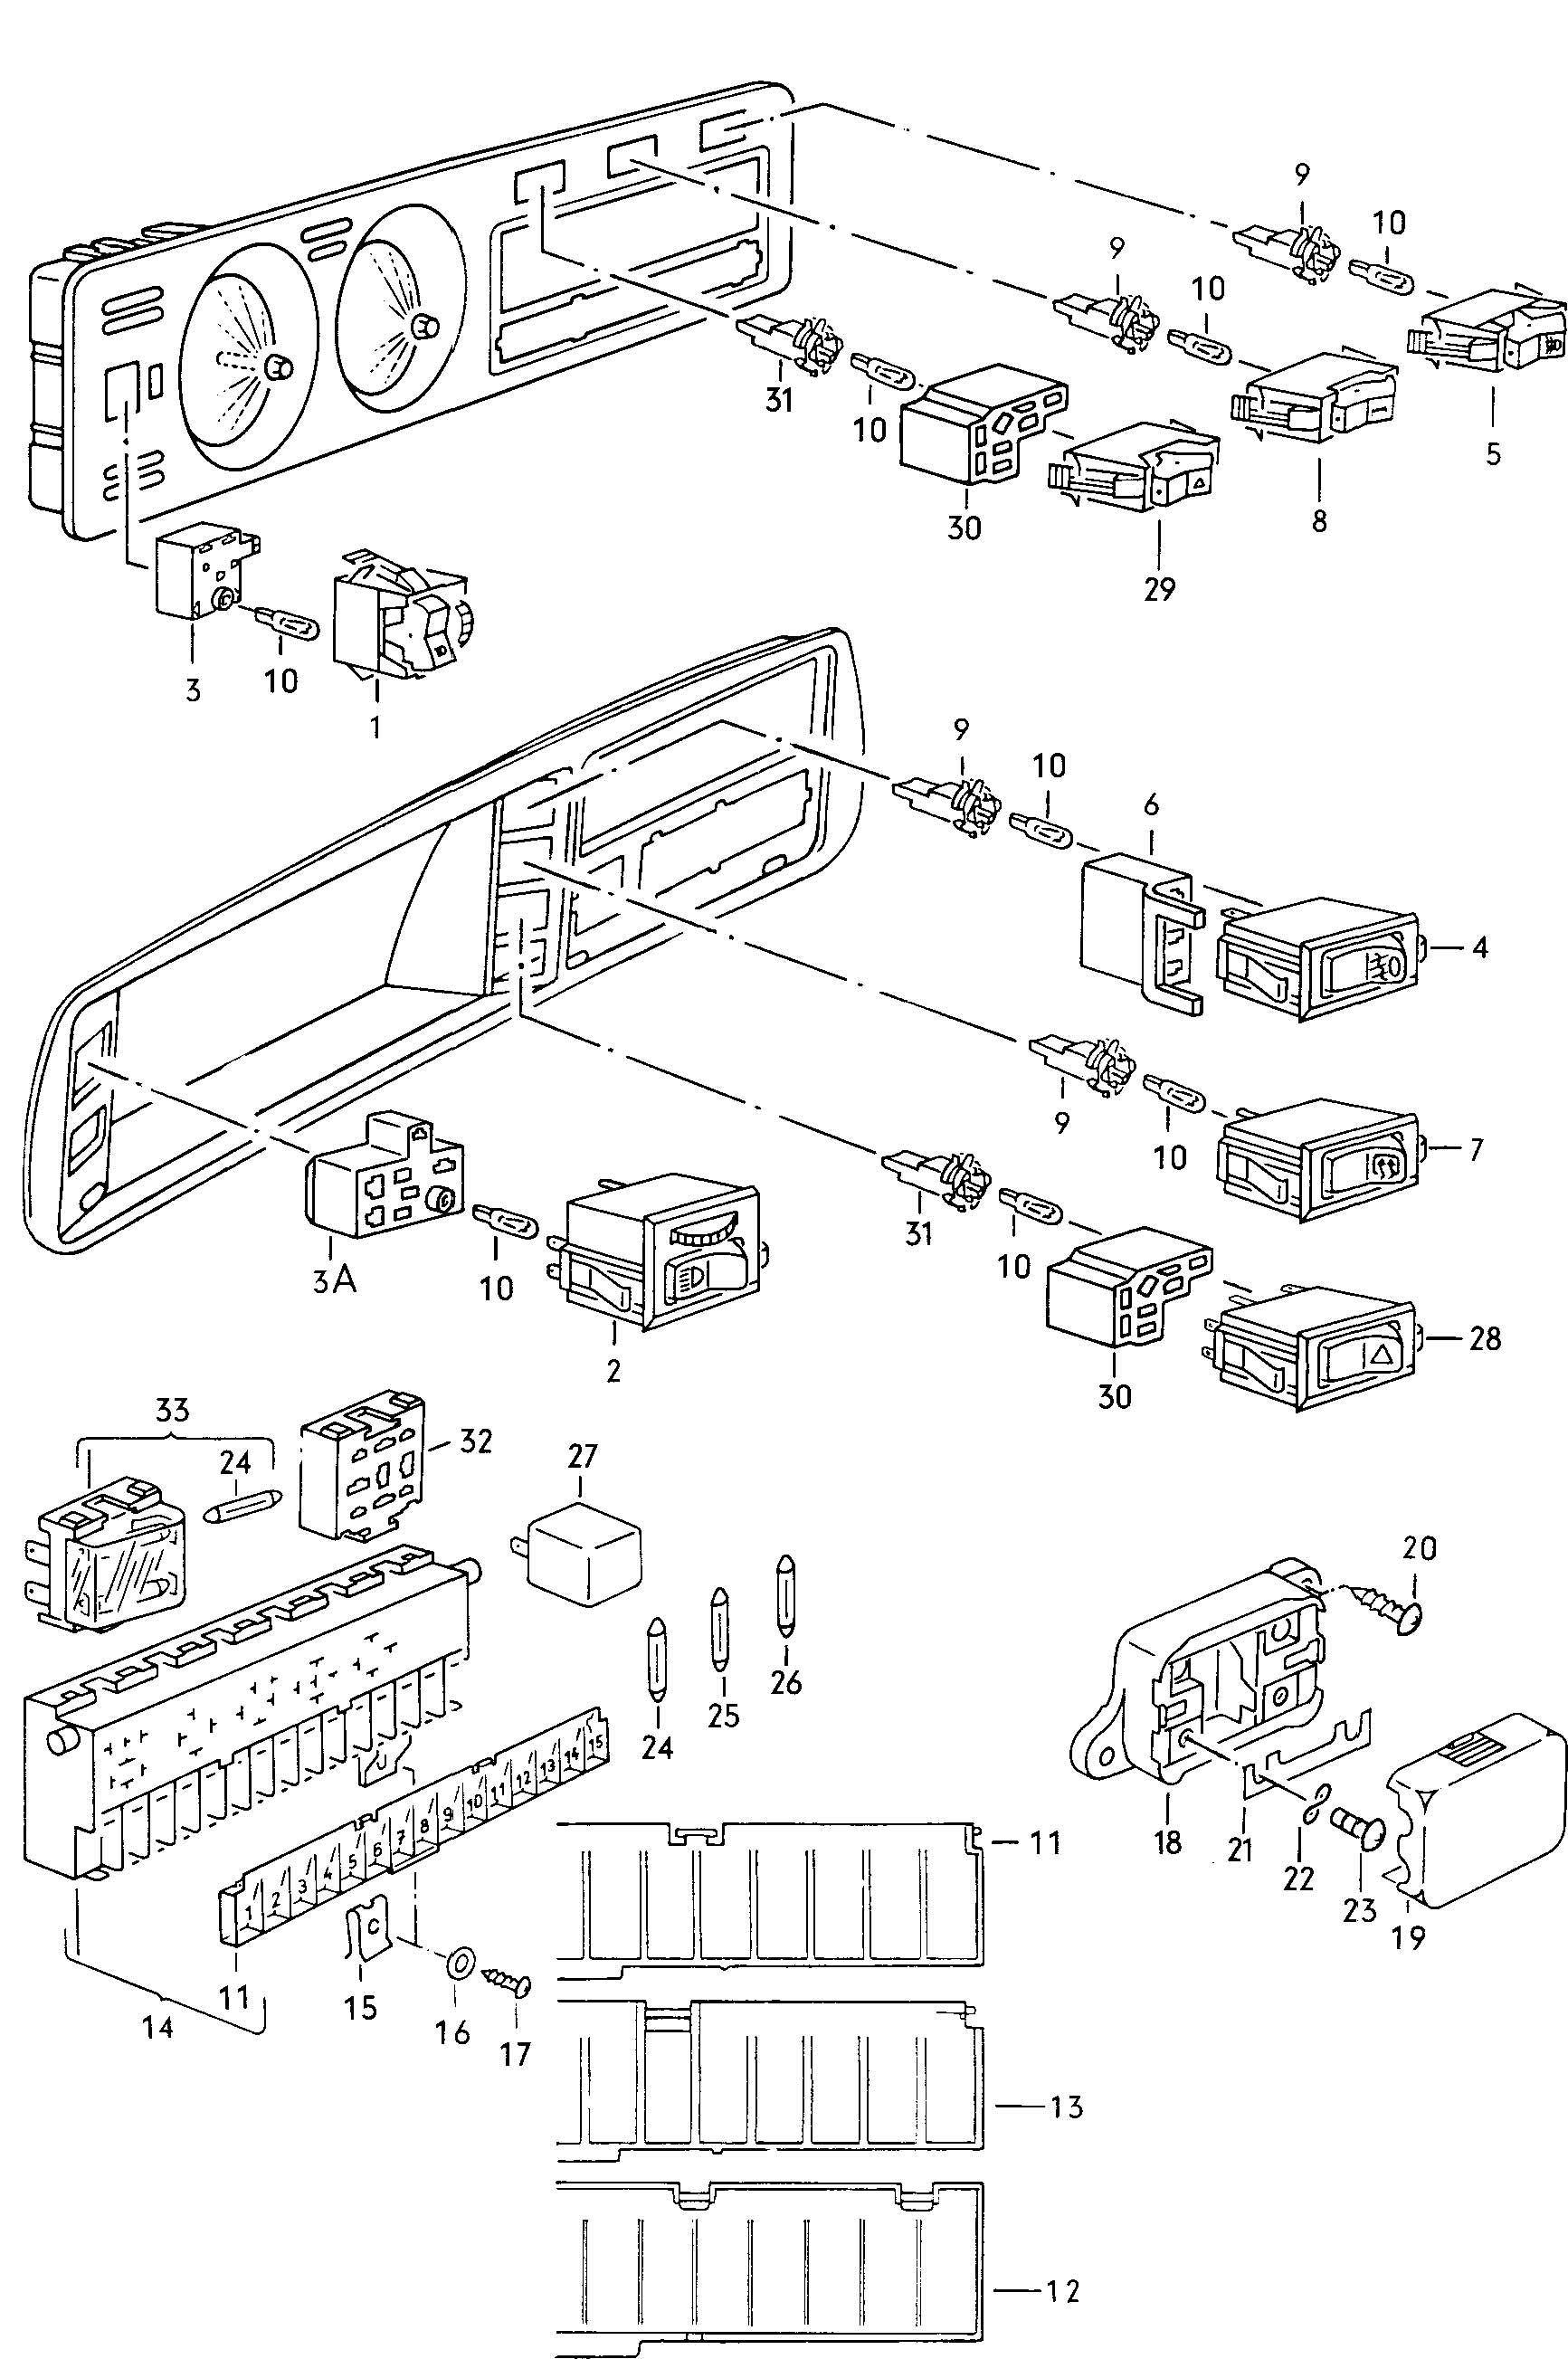 2012 volkswagen jetta 2.0 fuse box diagram